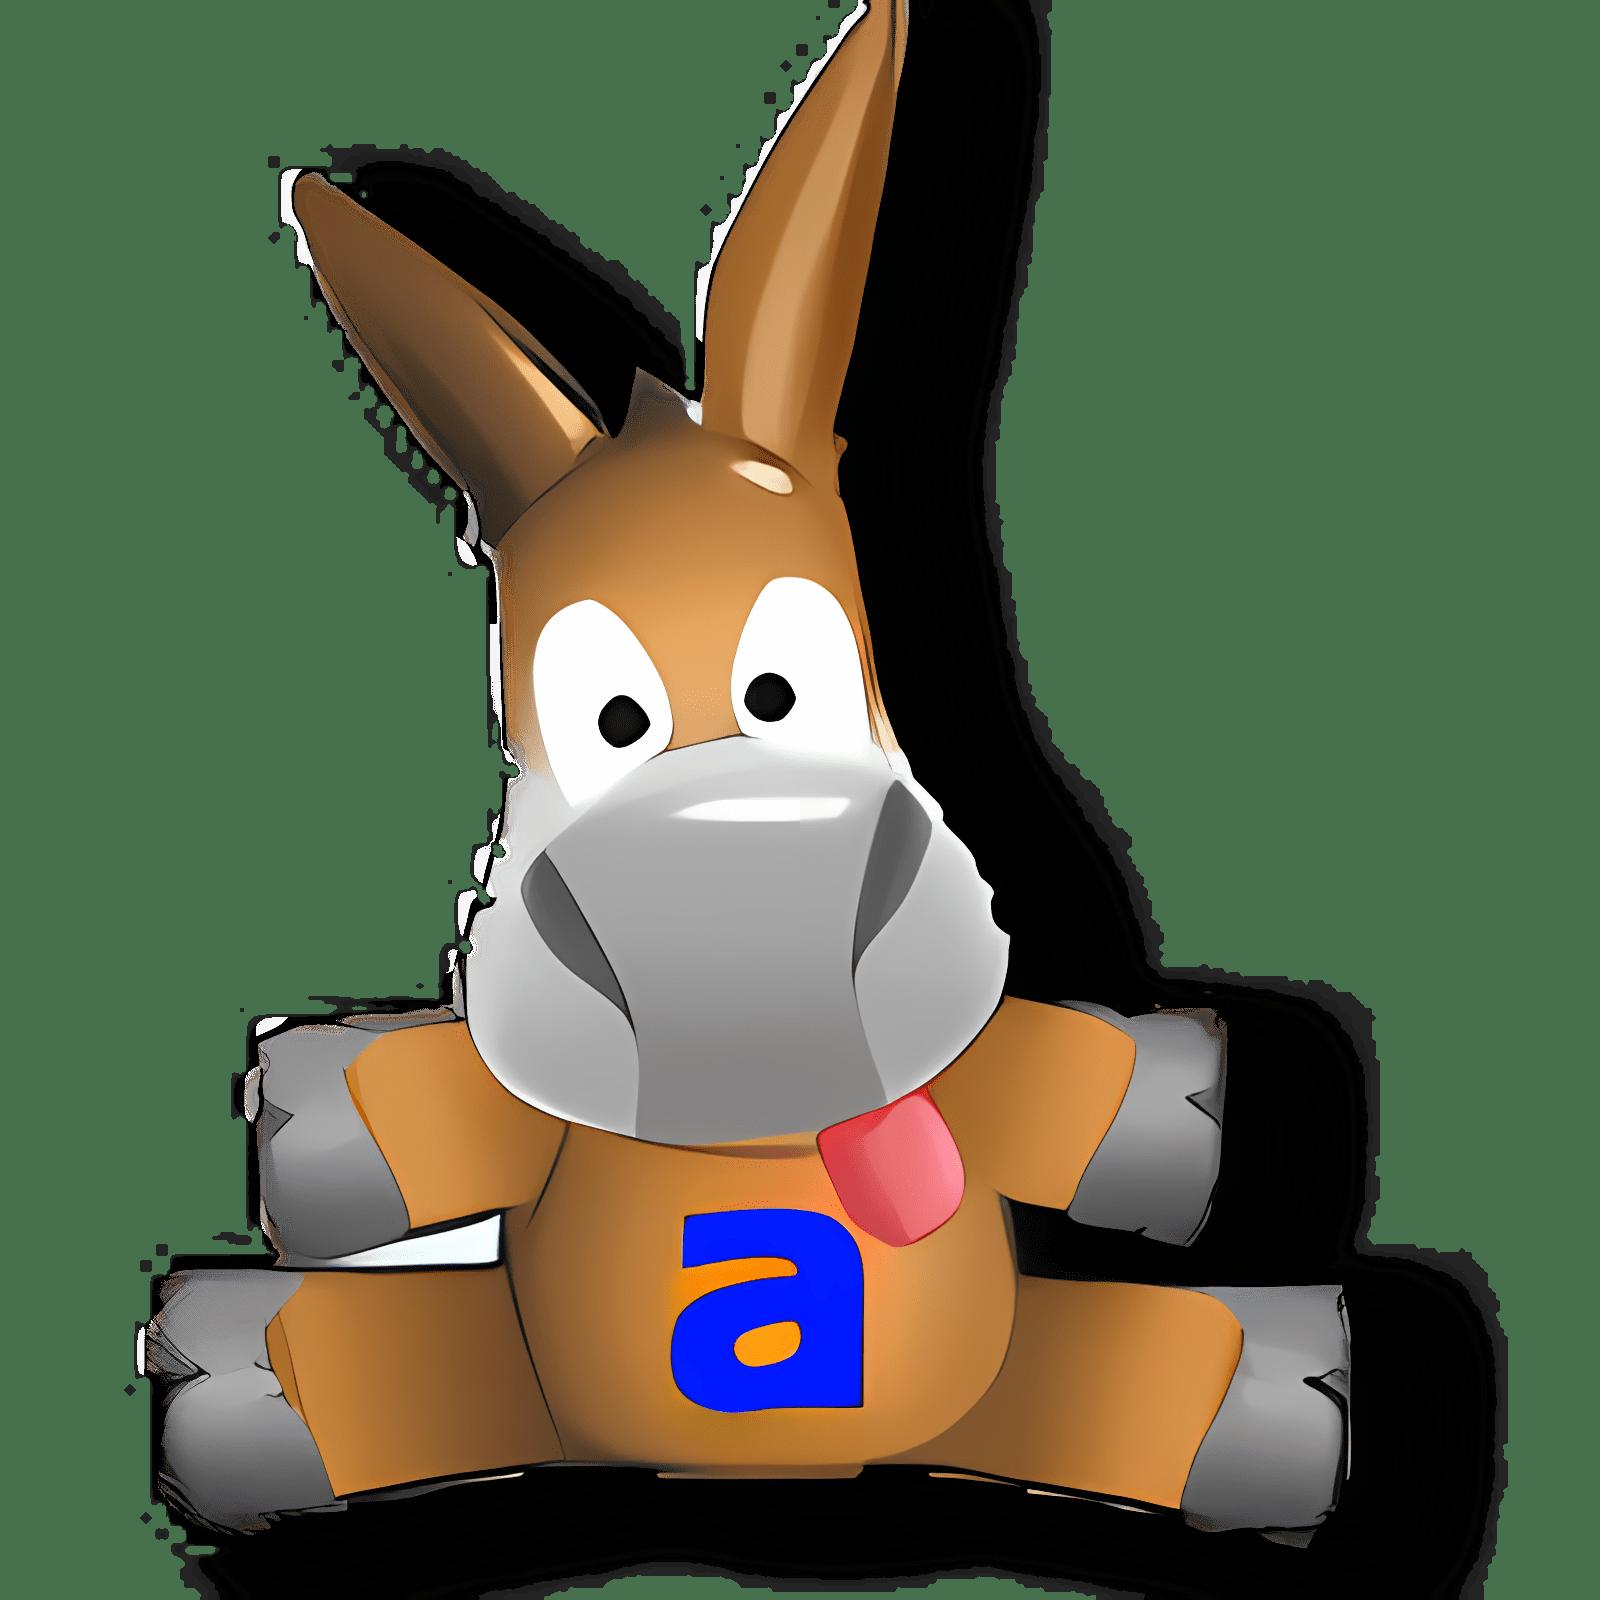 aMule 2.3.1